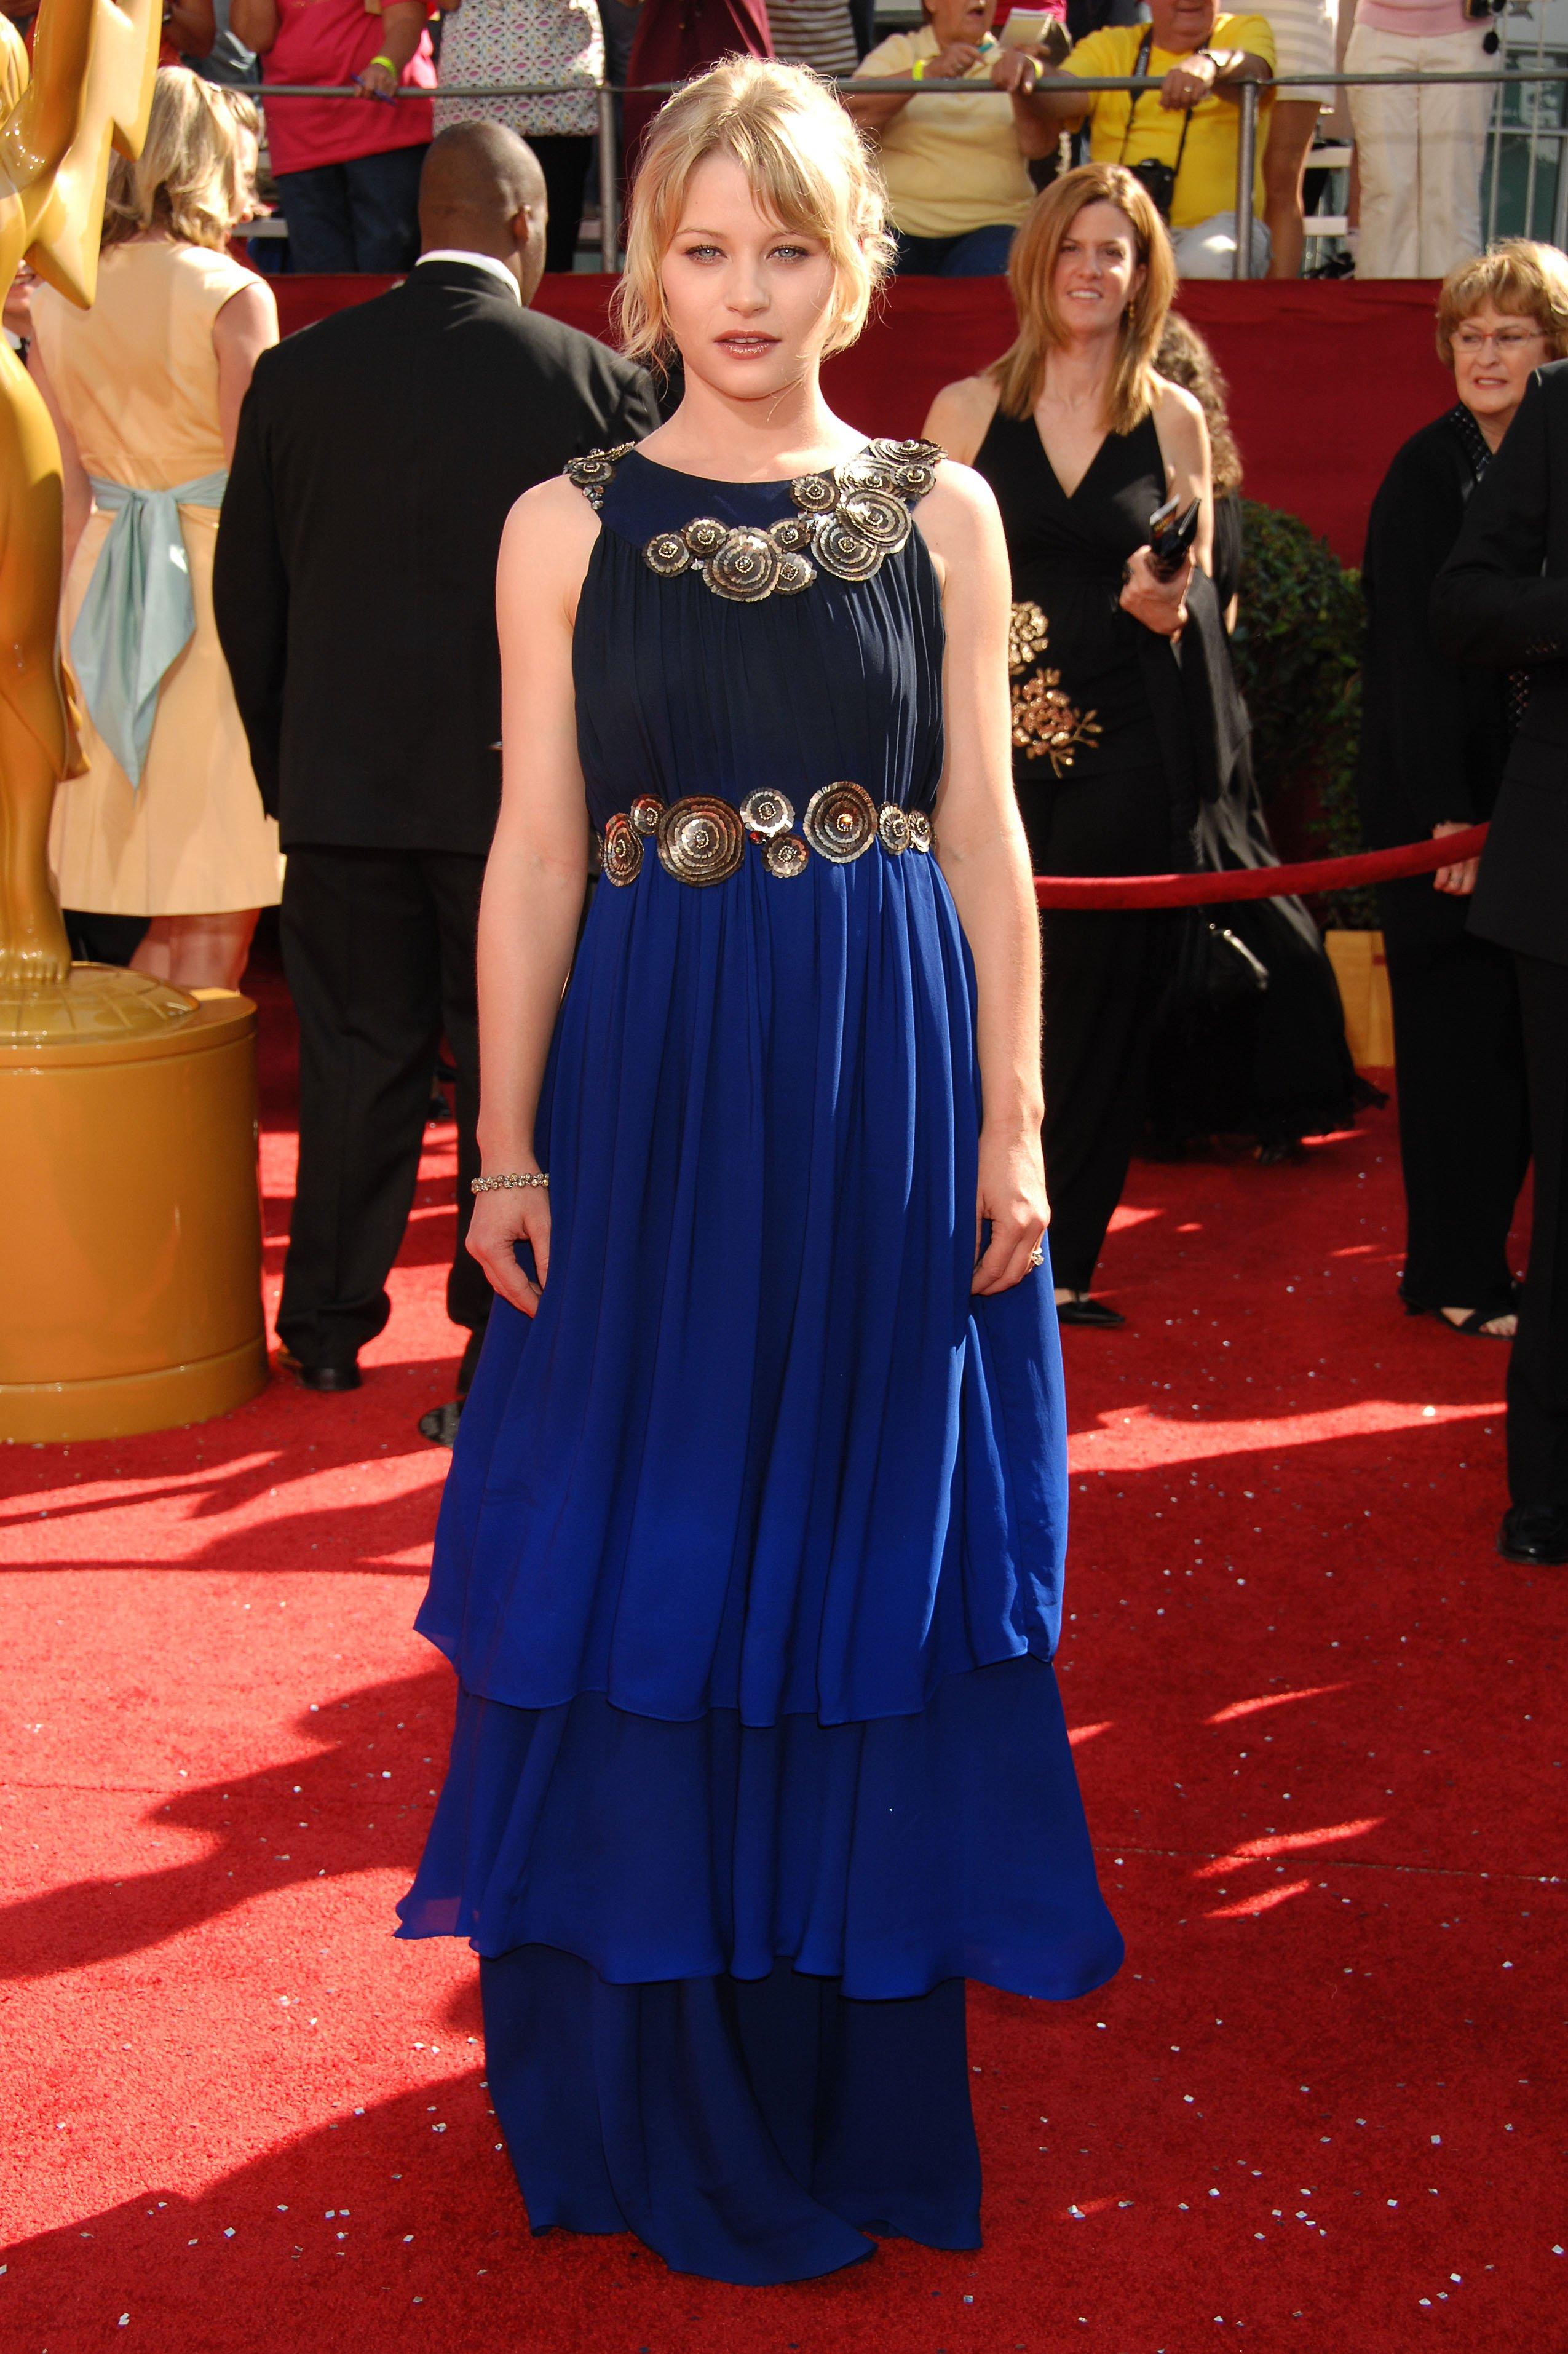 48270_Celebutopia-Emilie_de_Ravin_arrives_at_the_60th_Annual_Primetime_Emmy_Awards-06_122_949lo.JPG